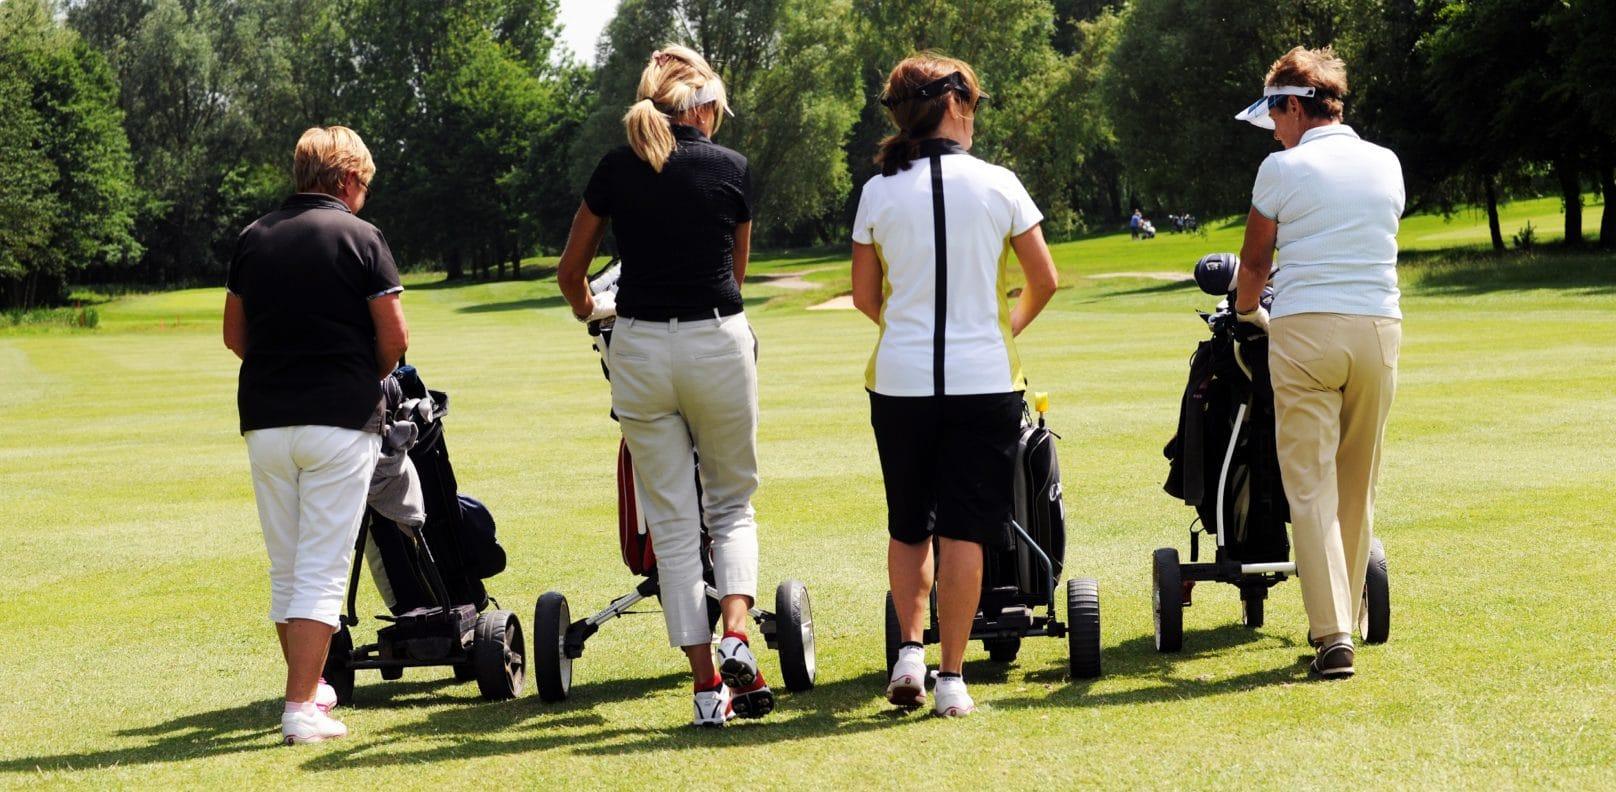 Ladies Golf Open - Pushing Golf Trolleys